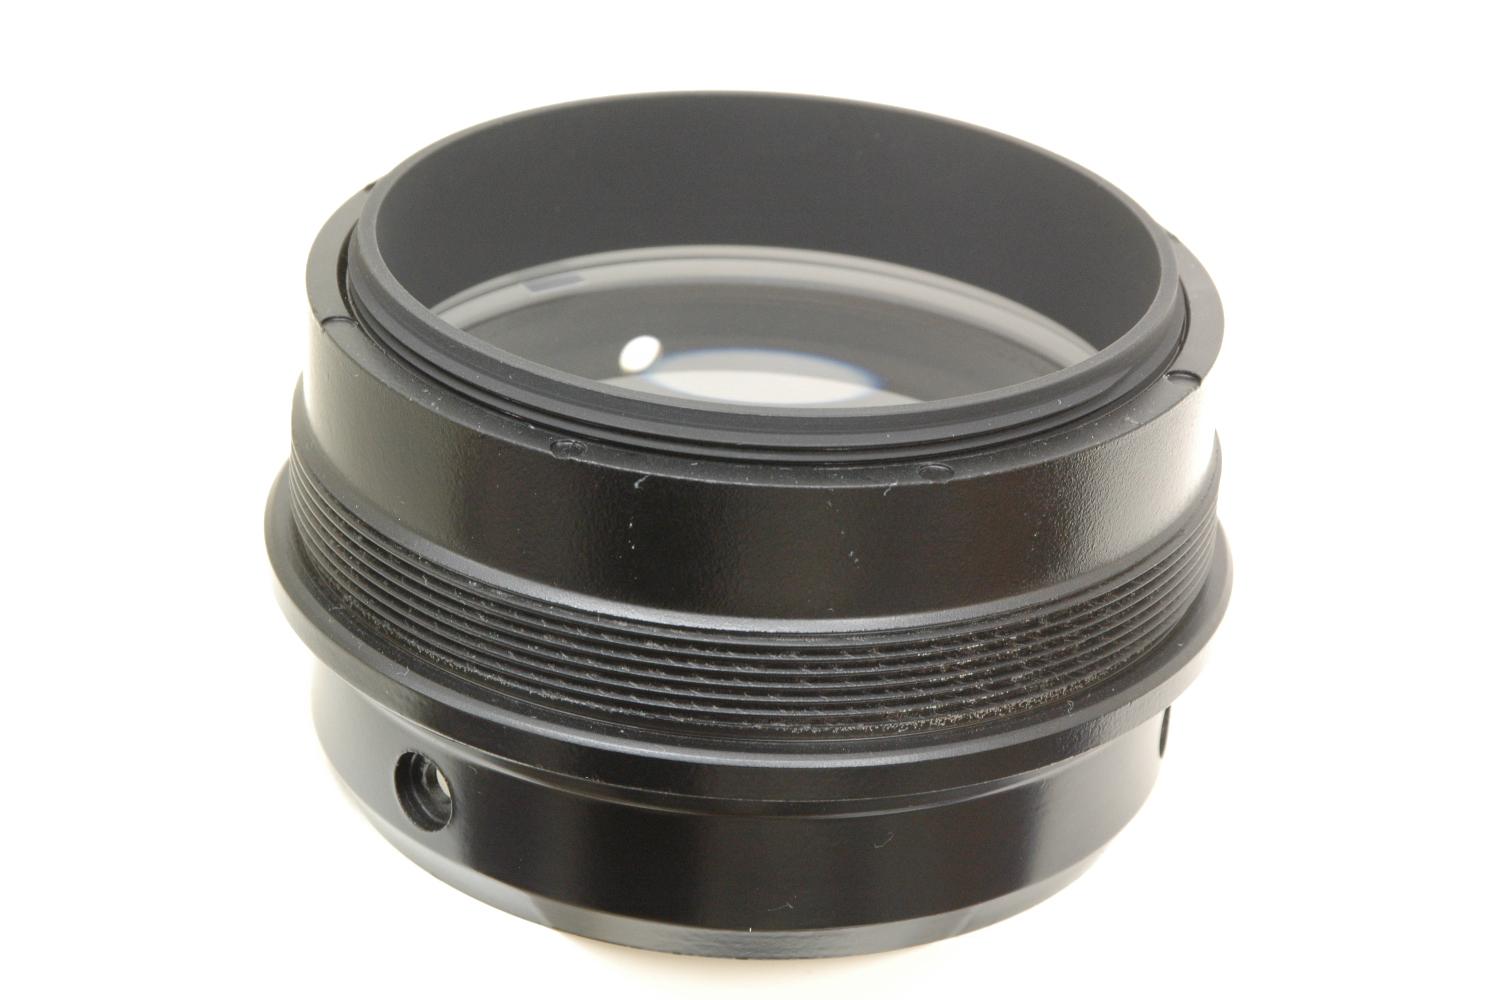 D80mmFL900mmフルコートアクロマートレンズ金属セル付◎